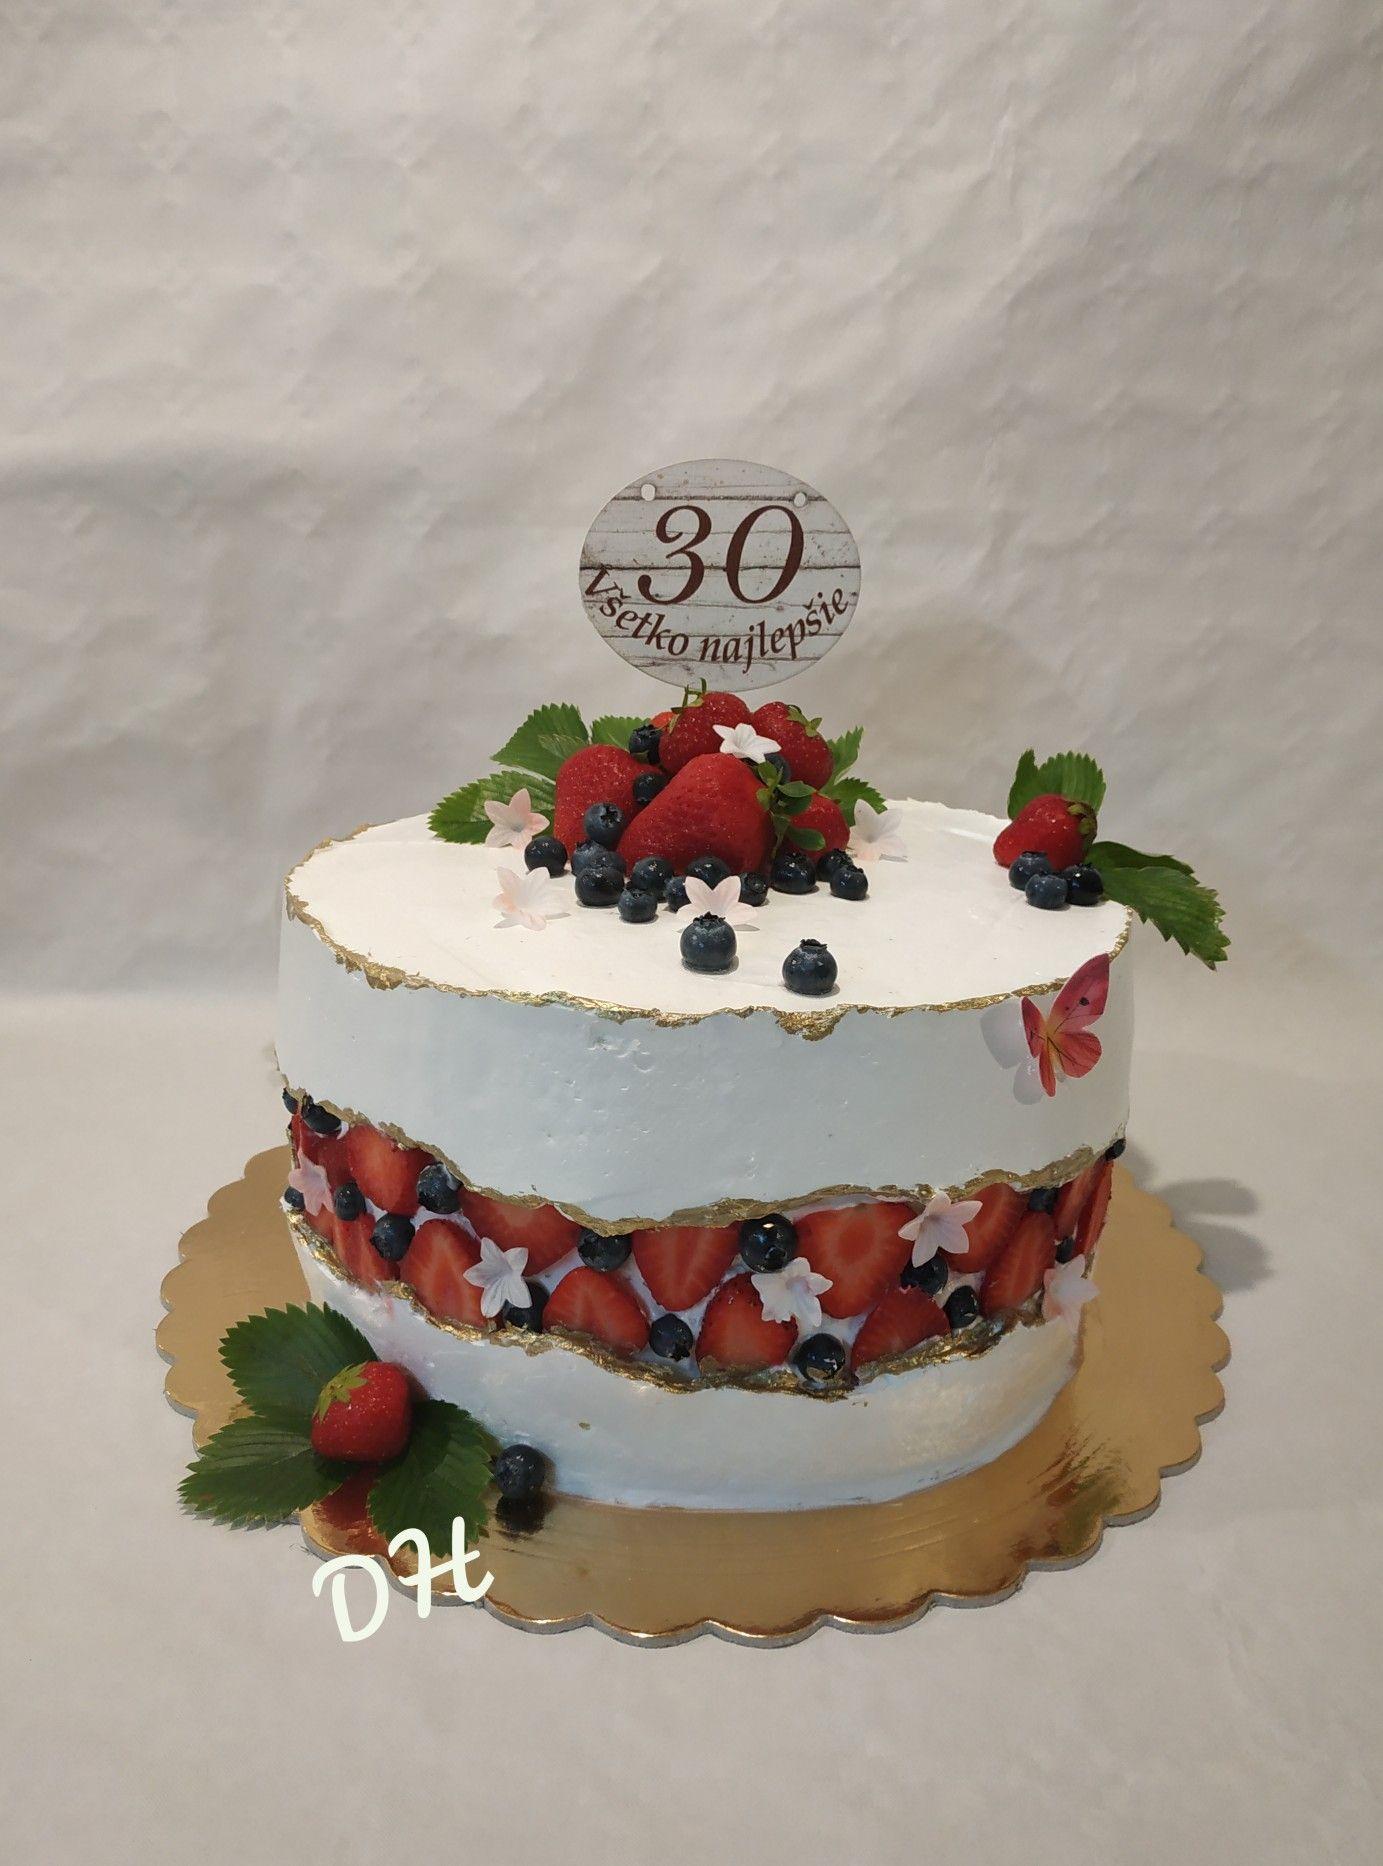 Pin by Darina Hrušovská on Birthdays cakes in 2020